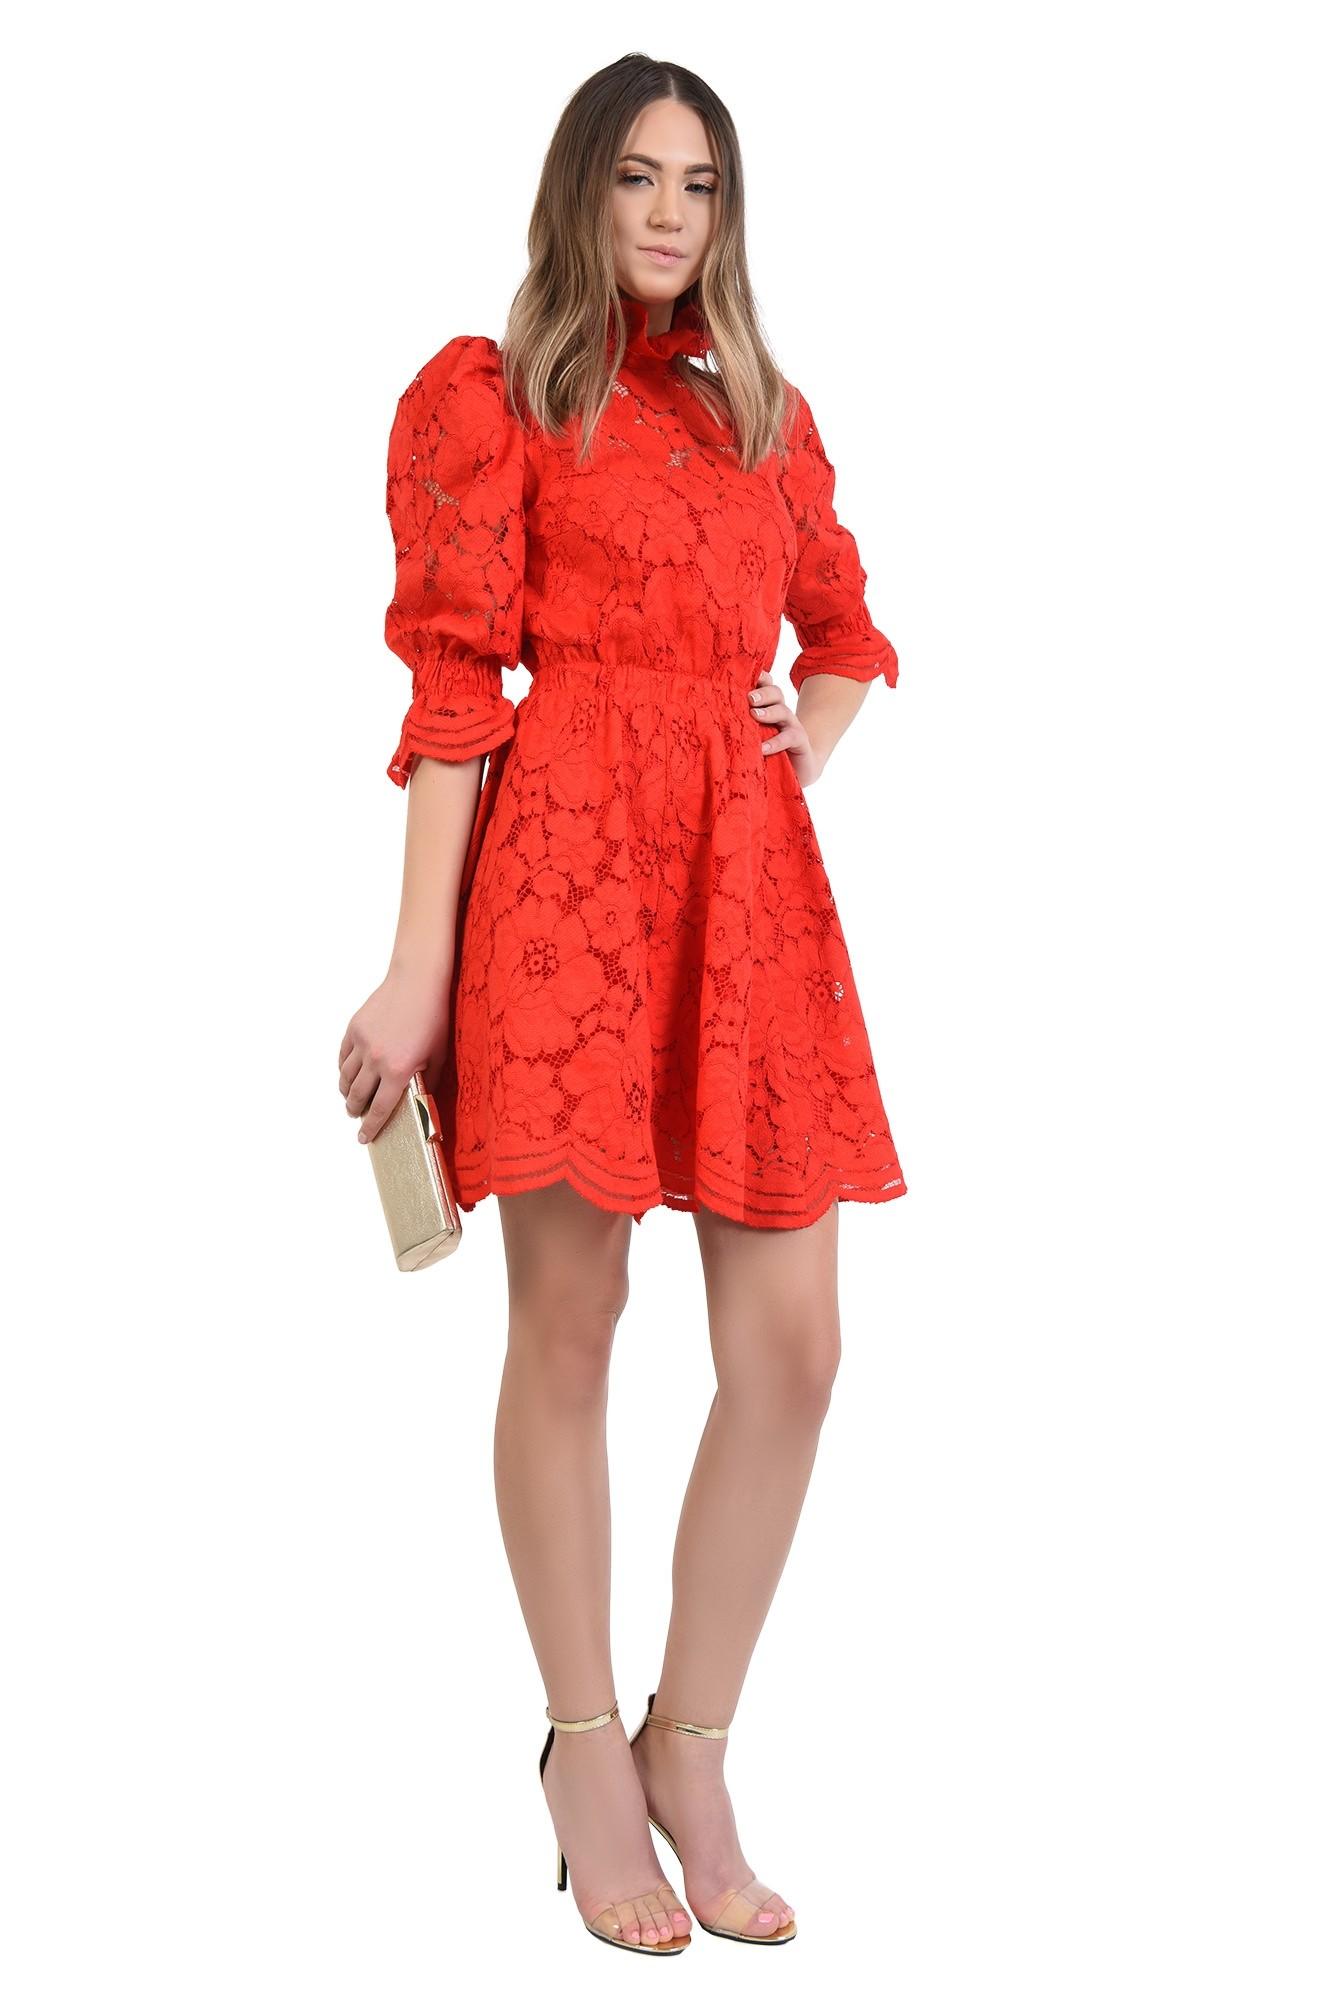 3 - 360 - rochie de ocazie, din dantela, rosie, clos, scurta